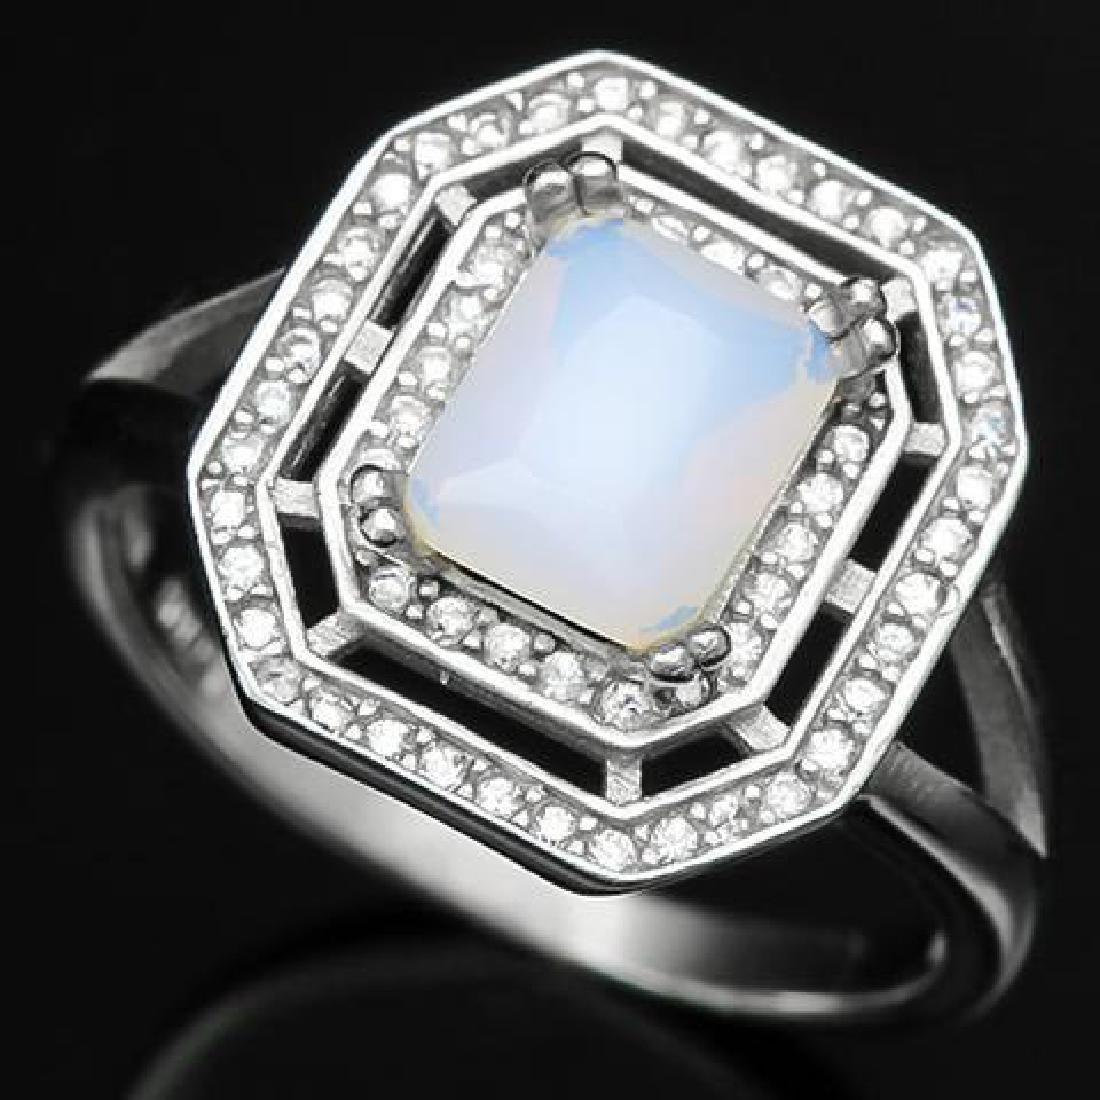 1 1/4 CARAT CREATED FIRE OPAL & DIAMOND 925 STERLING SI